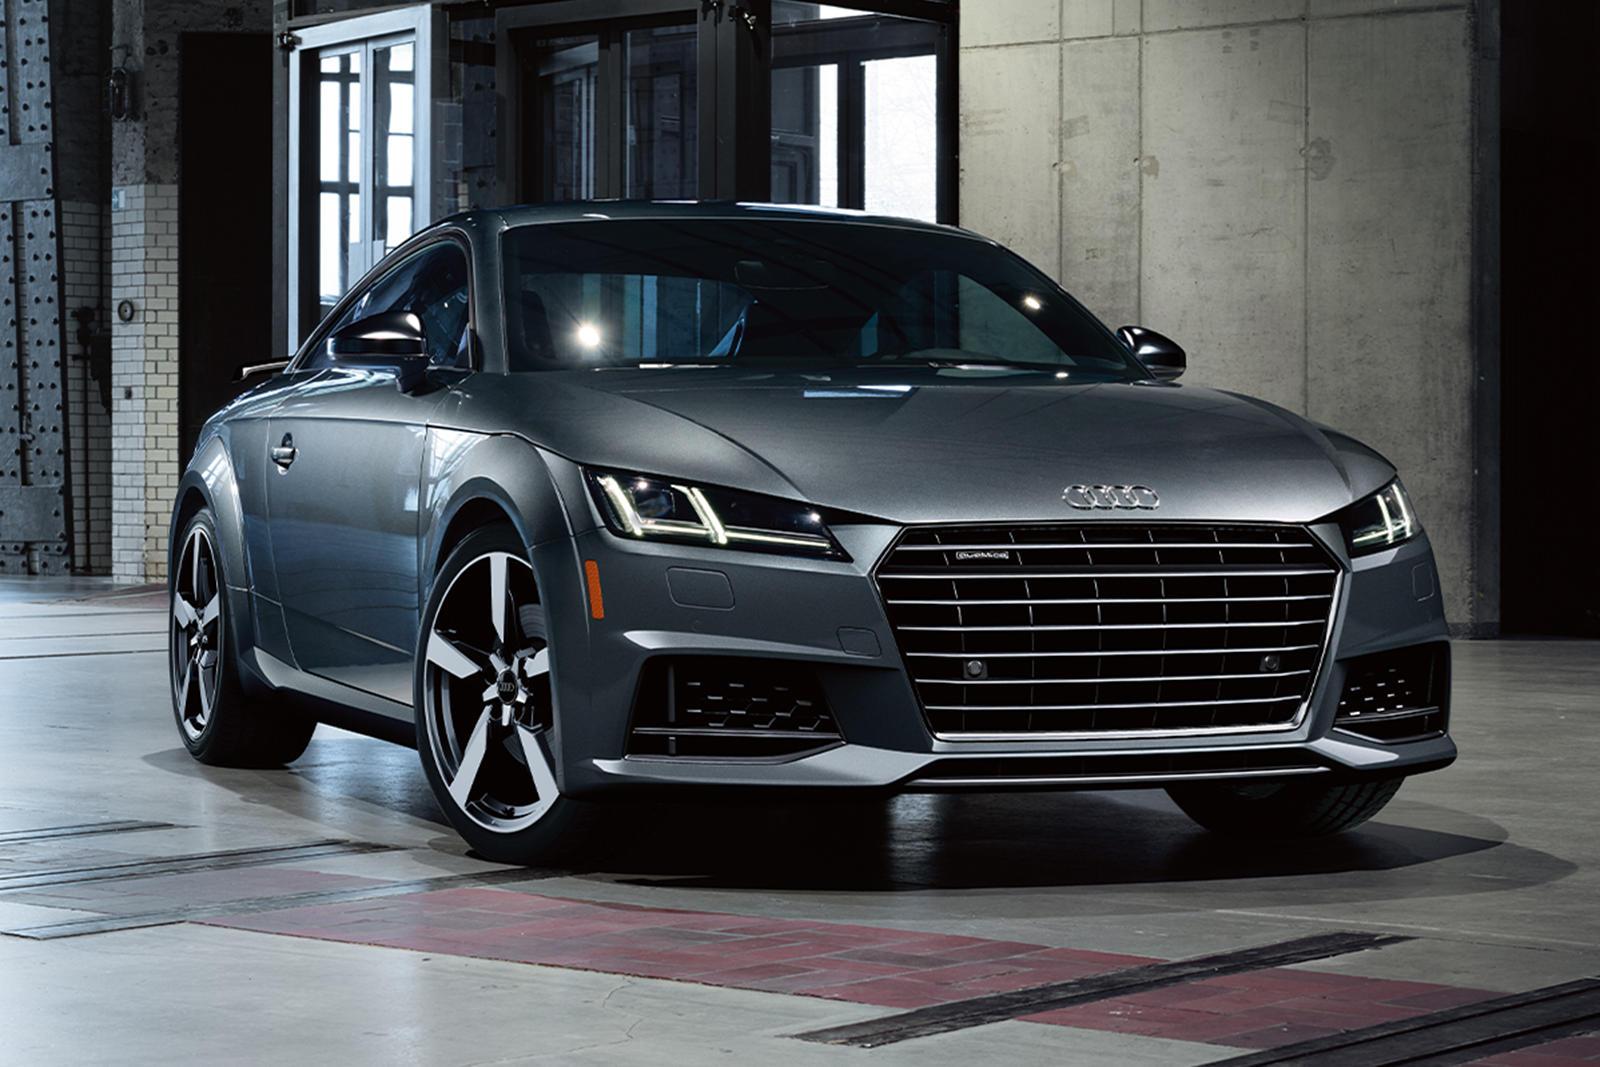 Audi Reveals New Updates For 2021 Models | CarBuzz